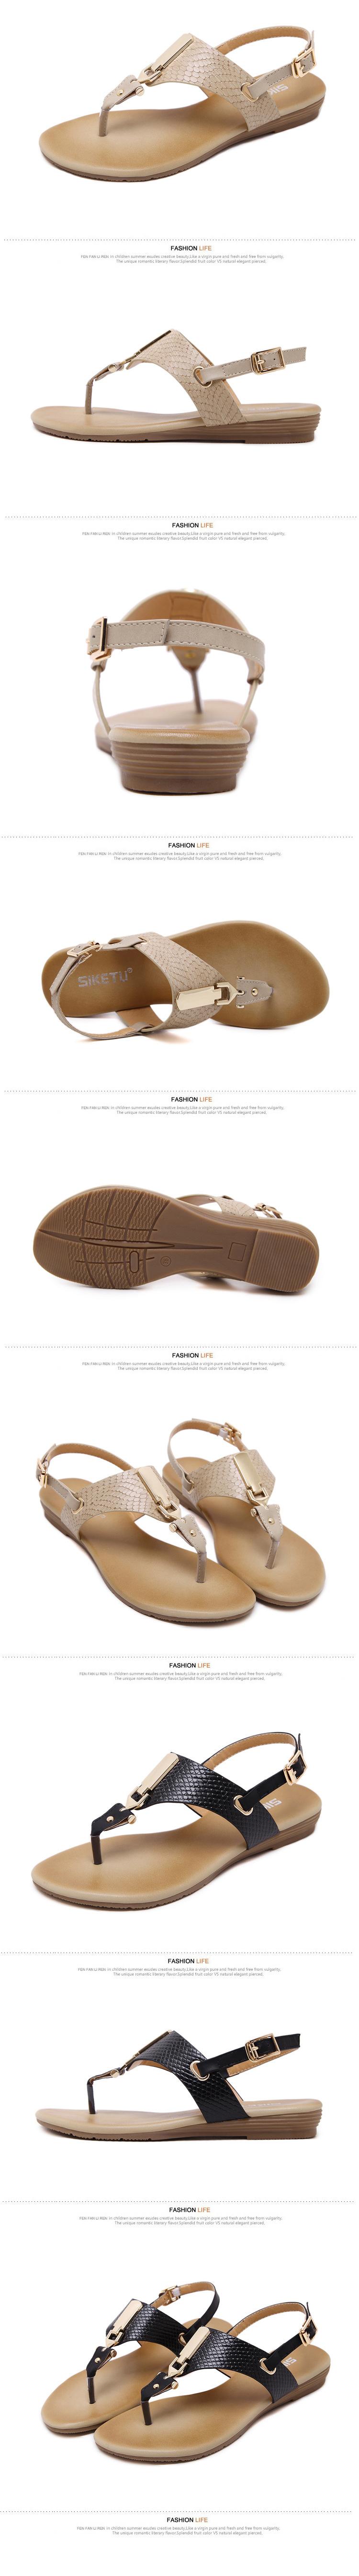 eec5691f8604b SUKETU Woman Shoes 2017 The Sandals Retro Style Flats Women s ...